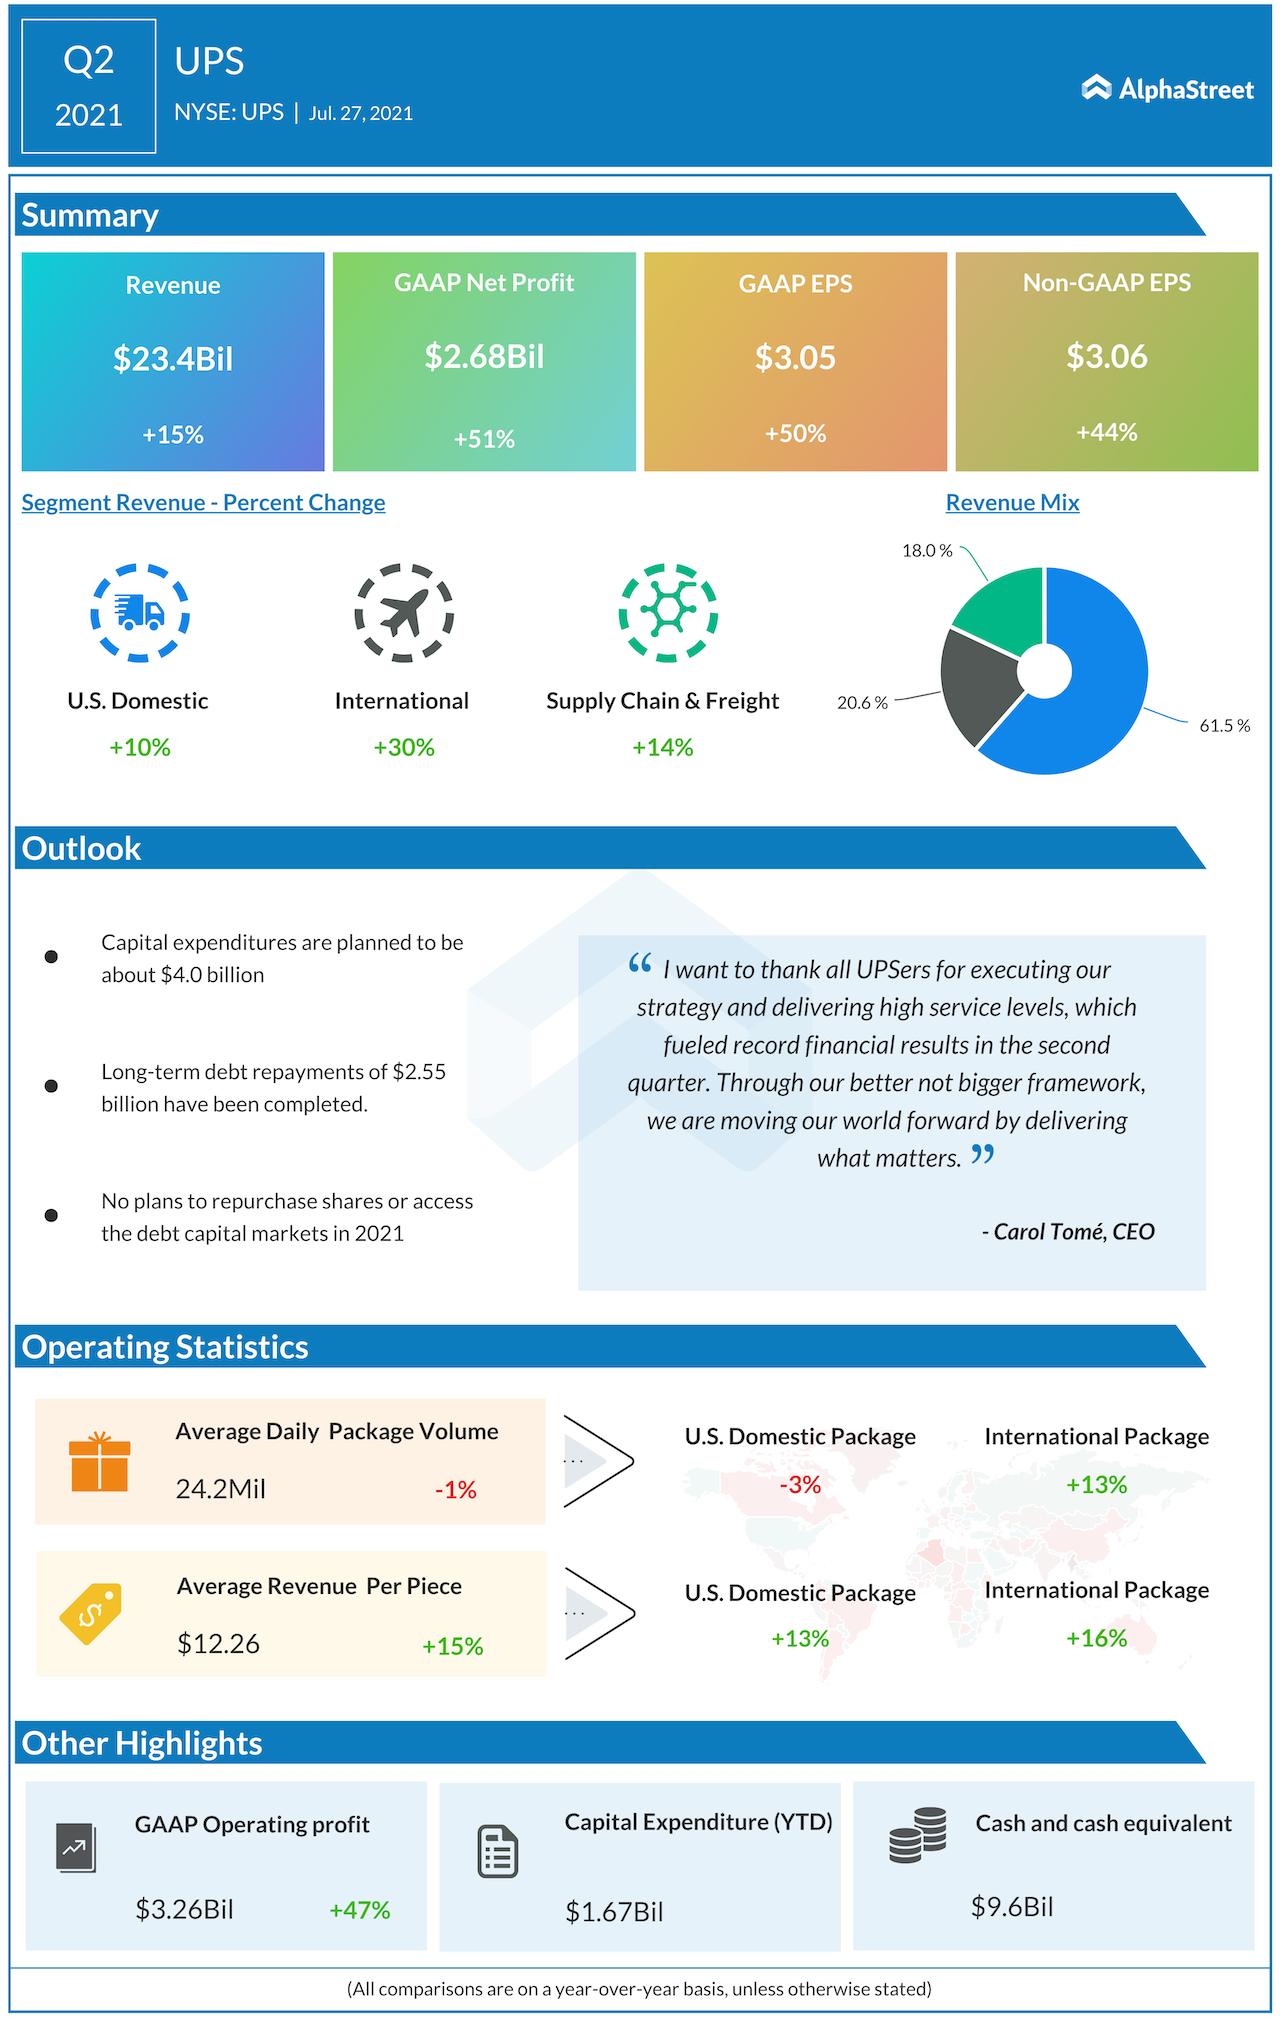 UPS Q2 2021 earnings